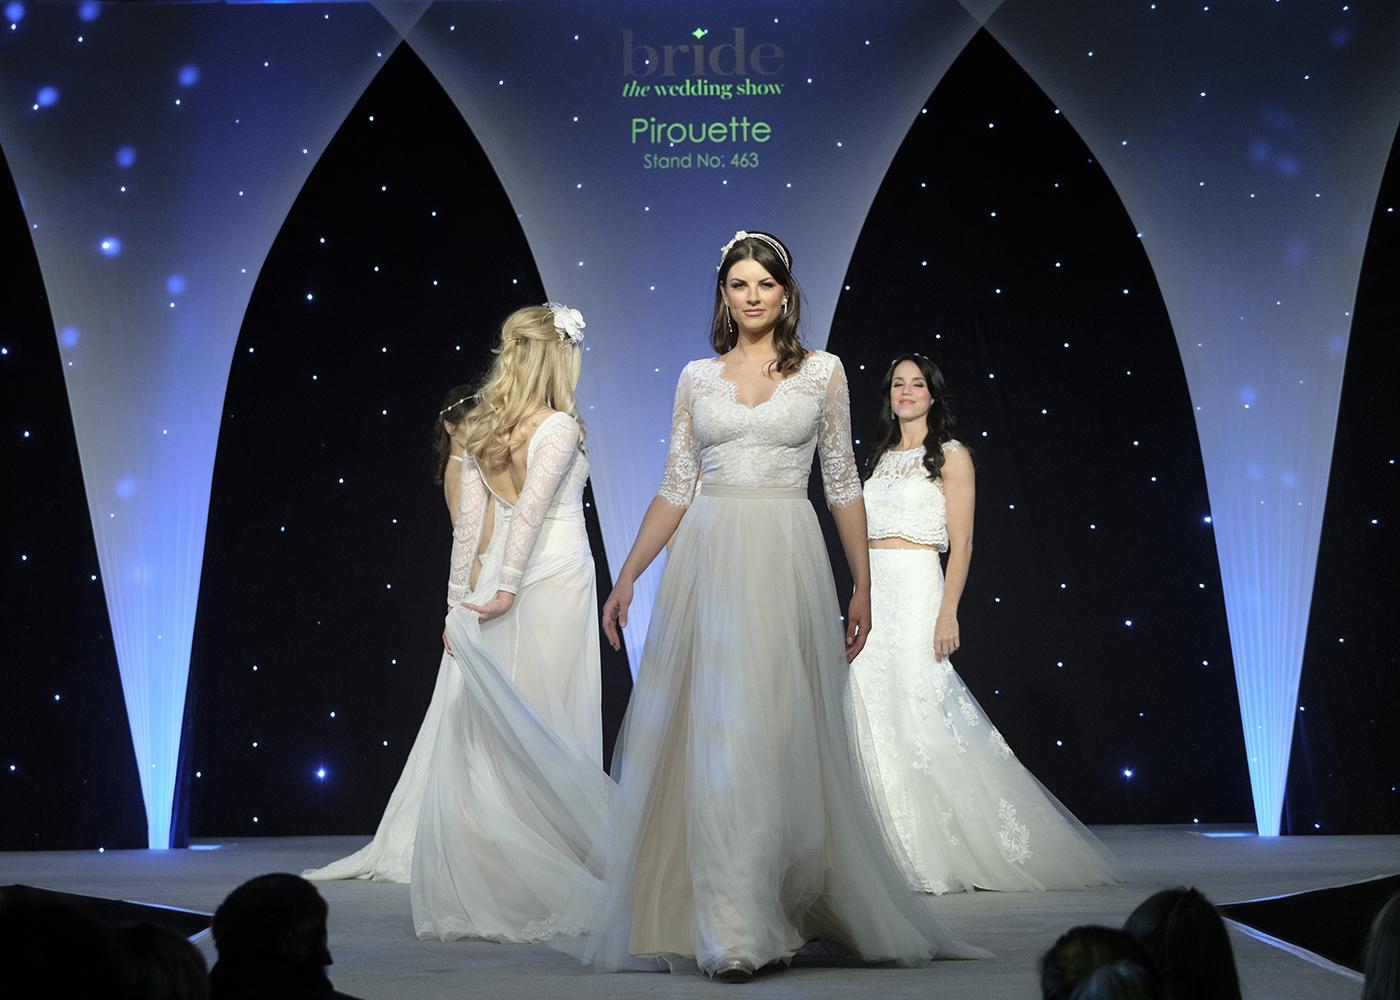 Bride: The Wedding Show